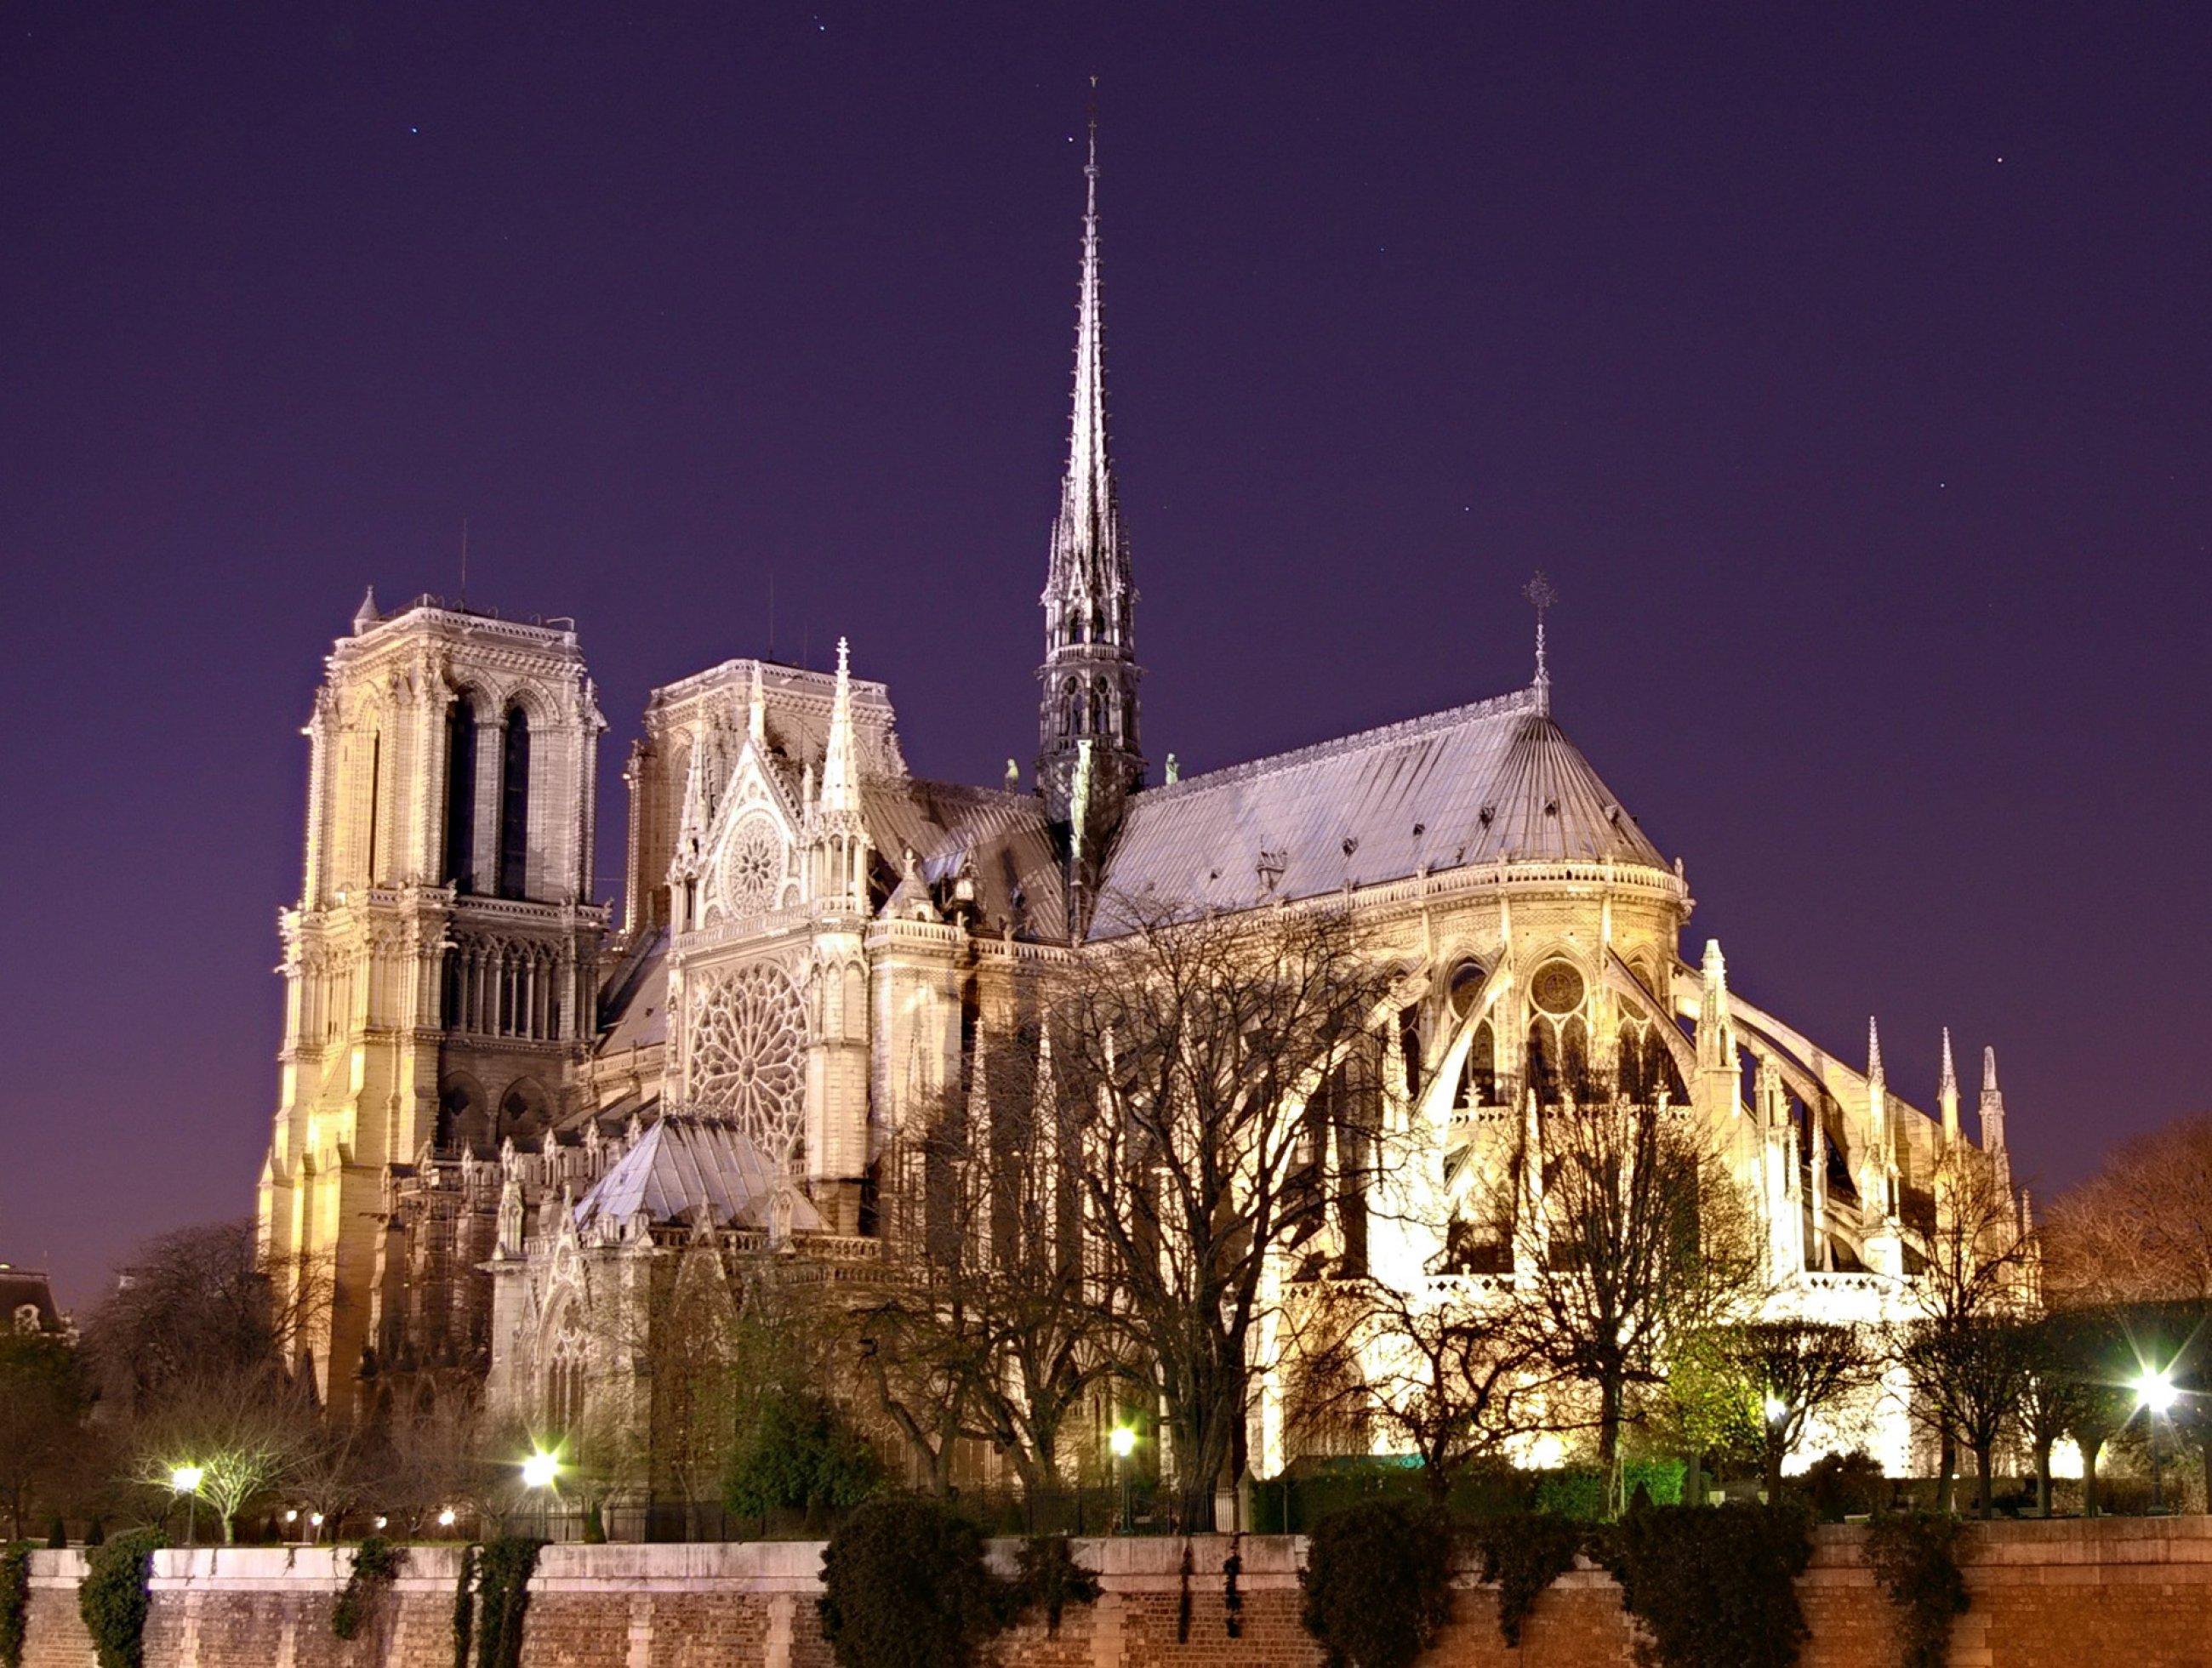 https://bubo.sk/uploads/galleries/7350/notre-dame-de-paris-by-night-time.jpg